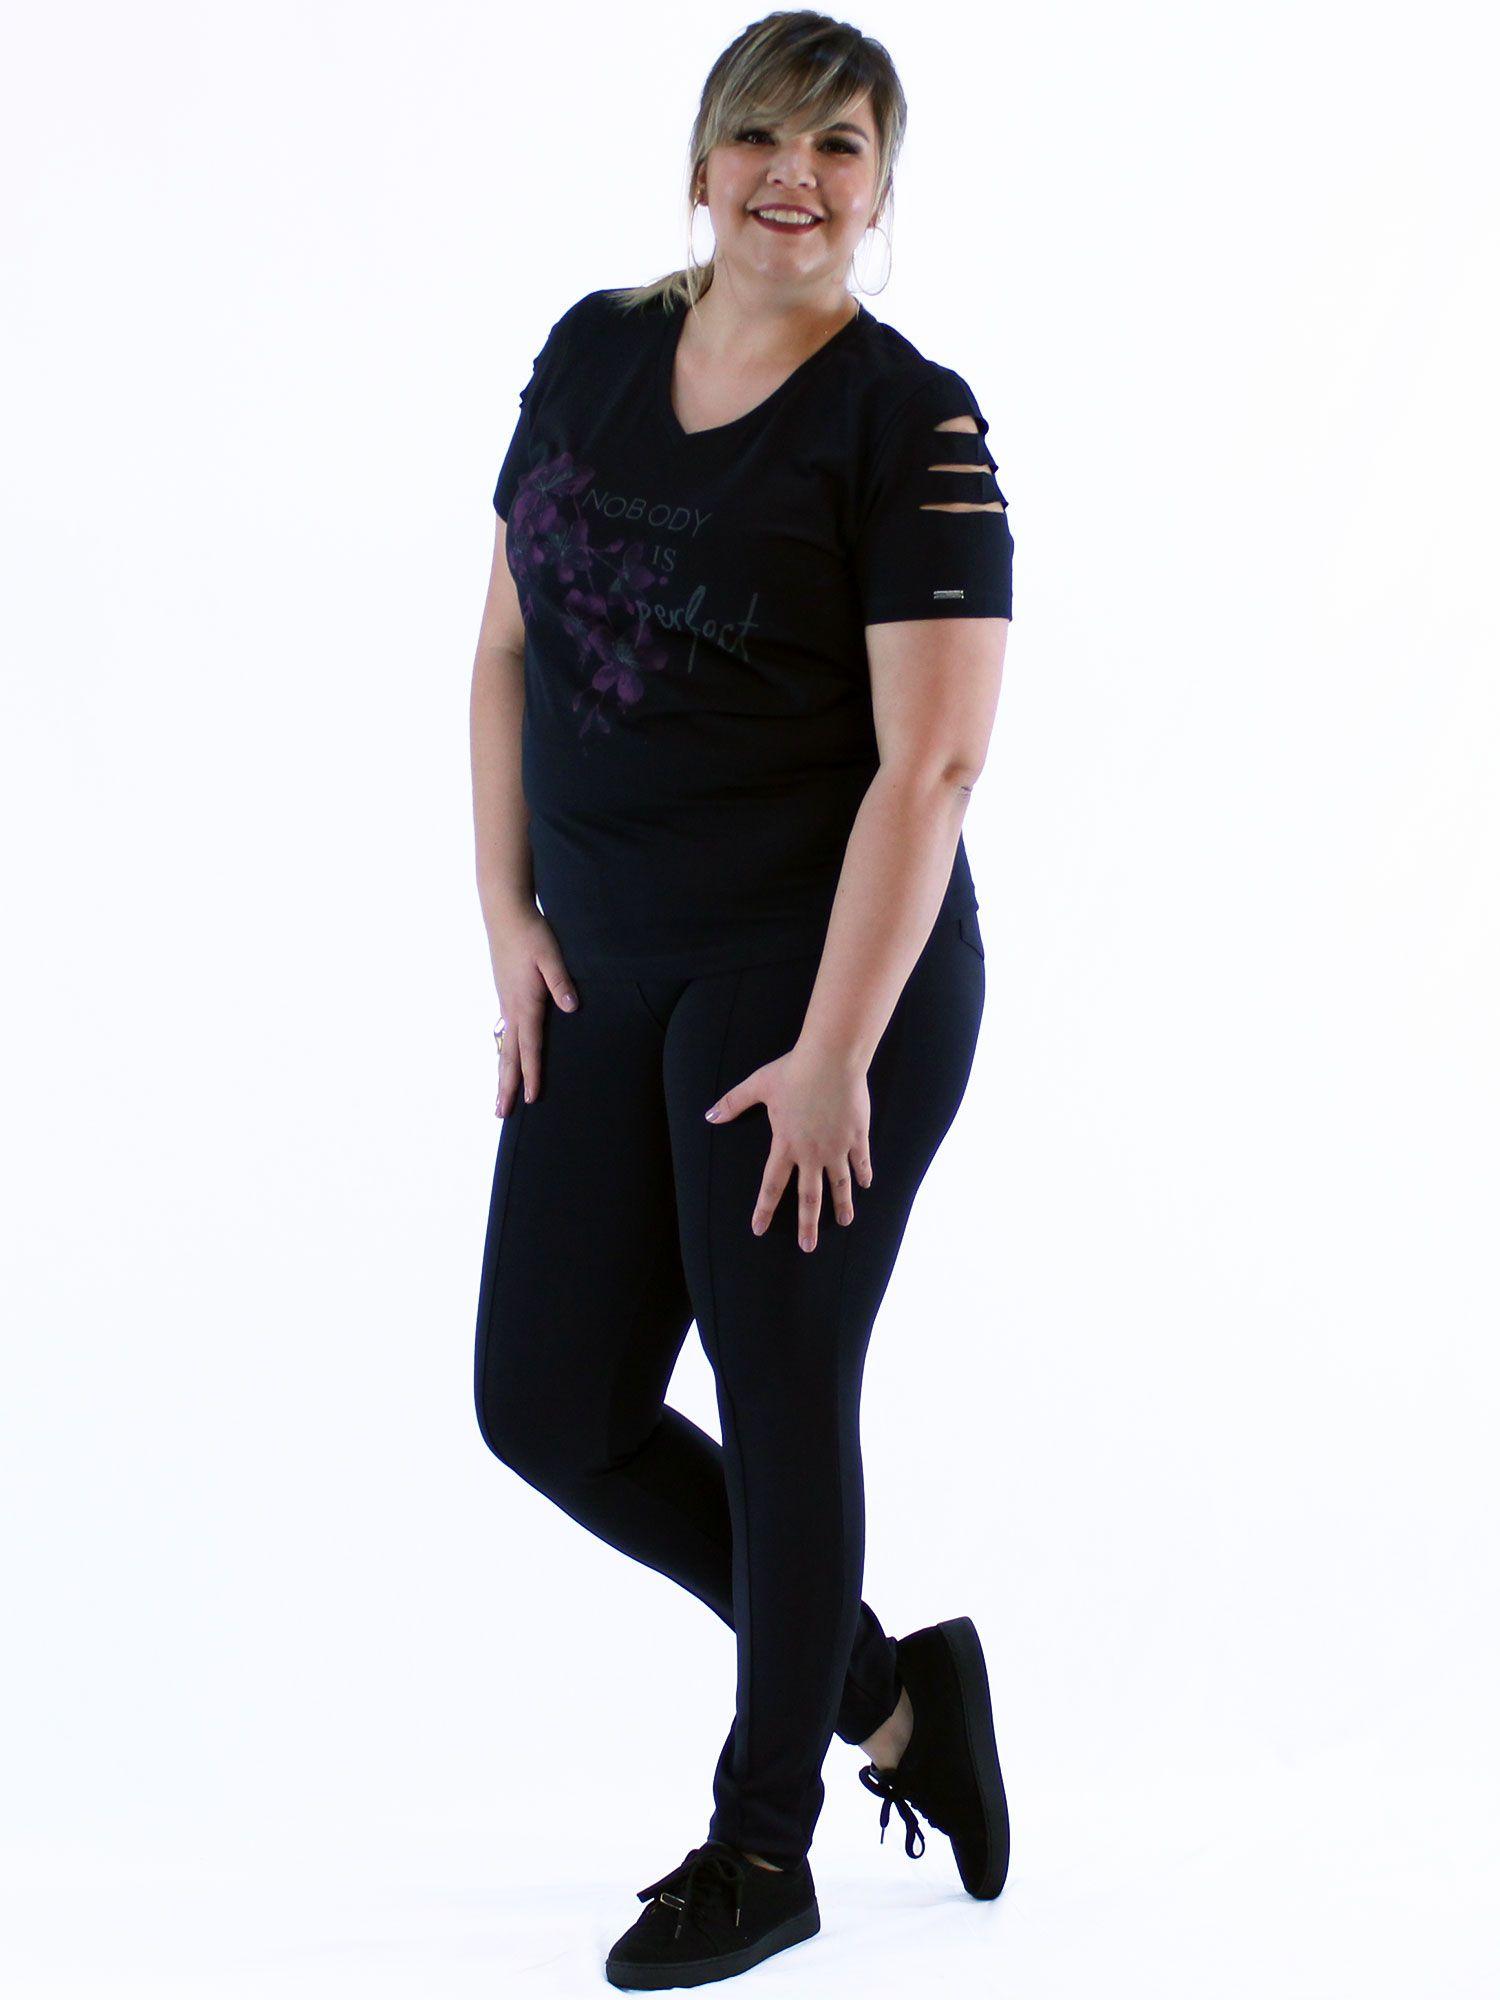 Blusa Decote V Plus Size KTS com Estampa Flor Preto